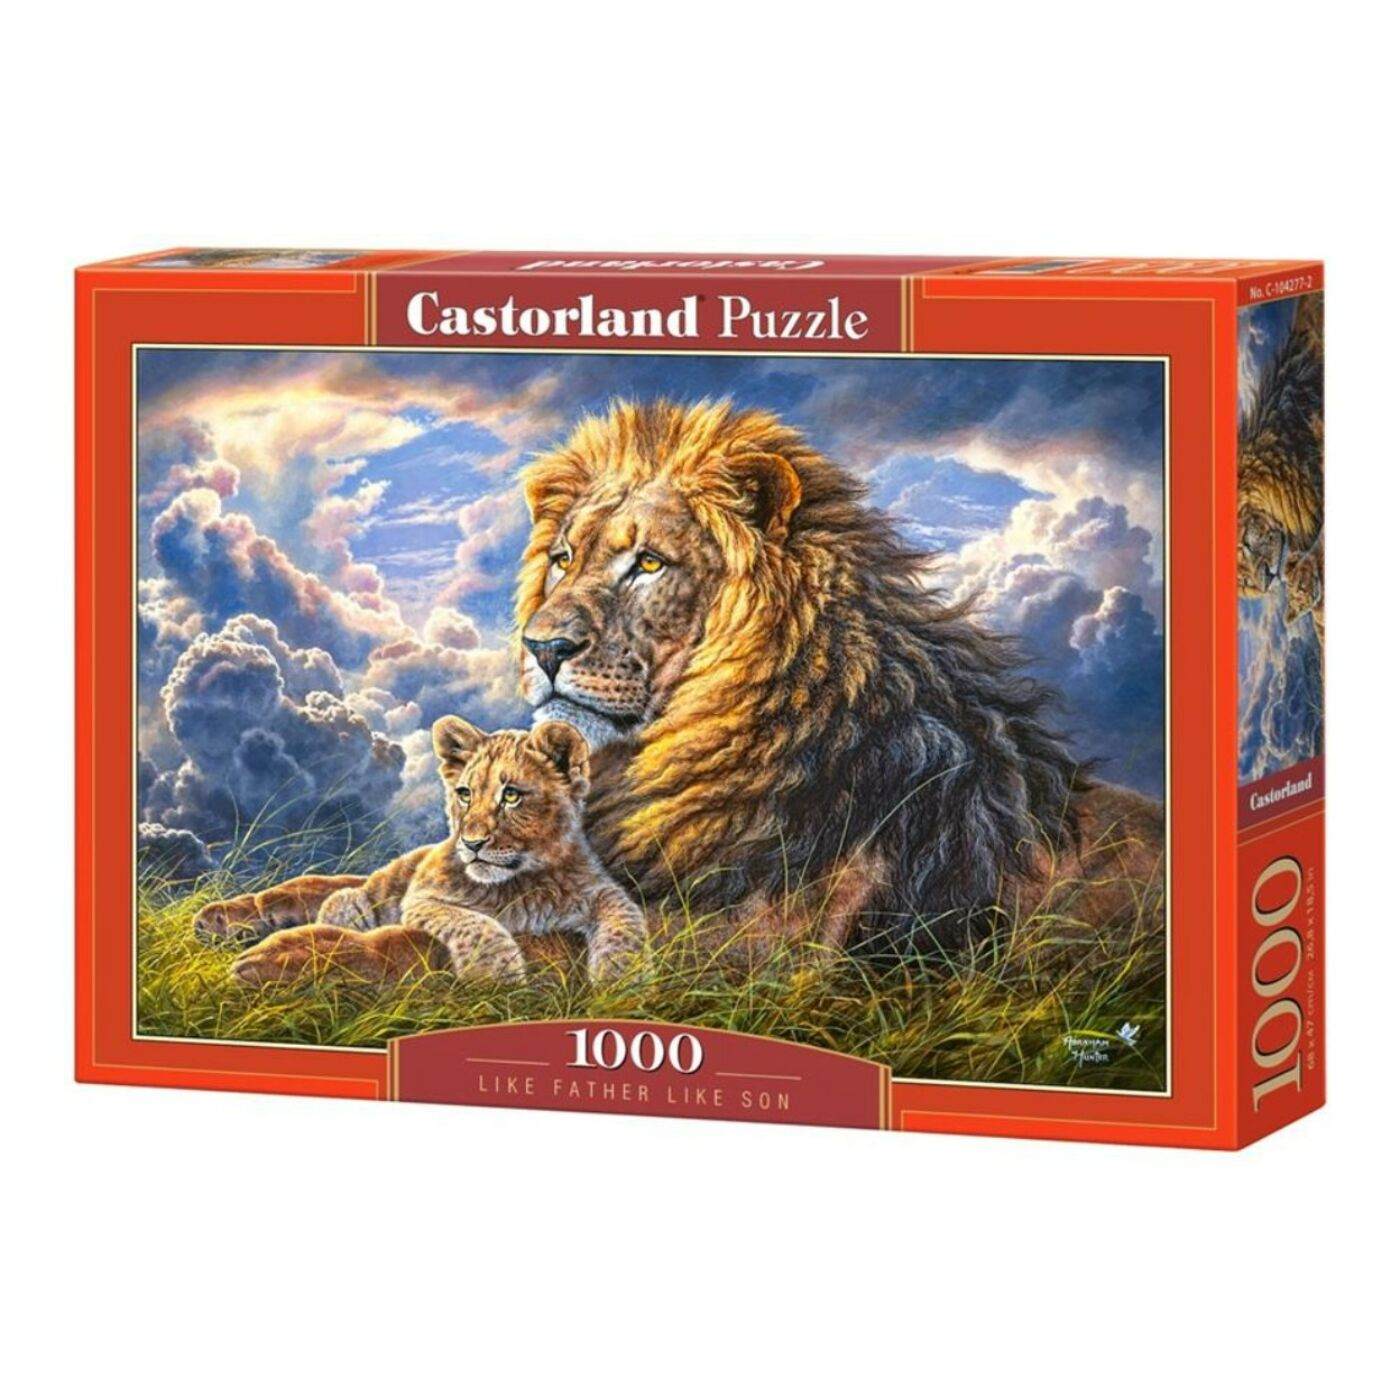 1000 db-os Castorland Puzzle - Apja fia